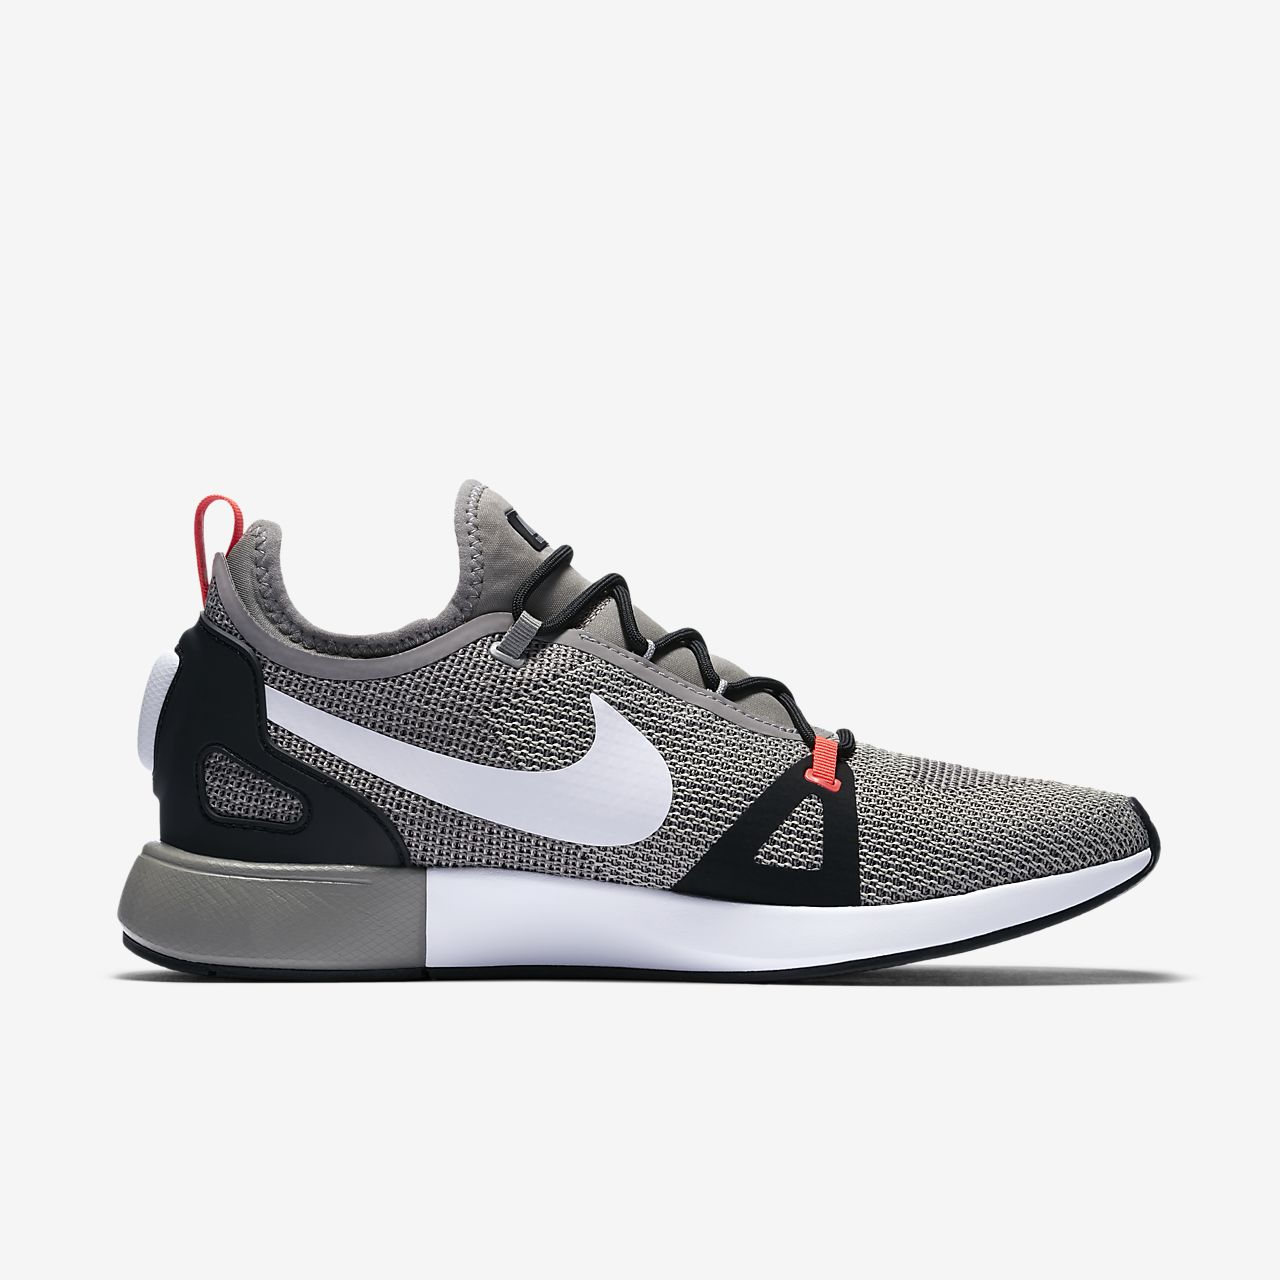 Hommes Runner 2 Md Maille Près Des Chaussures De Course Nike YKFGI2ER